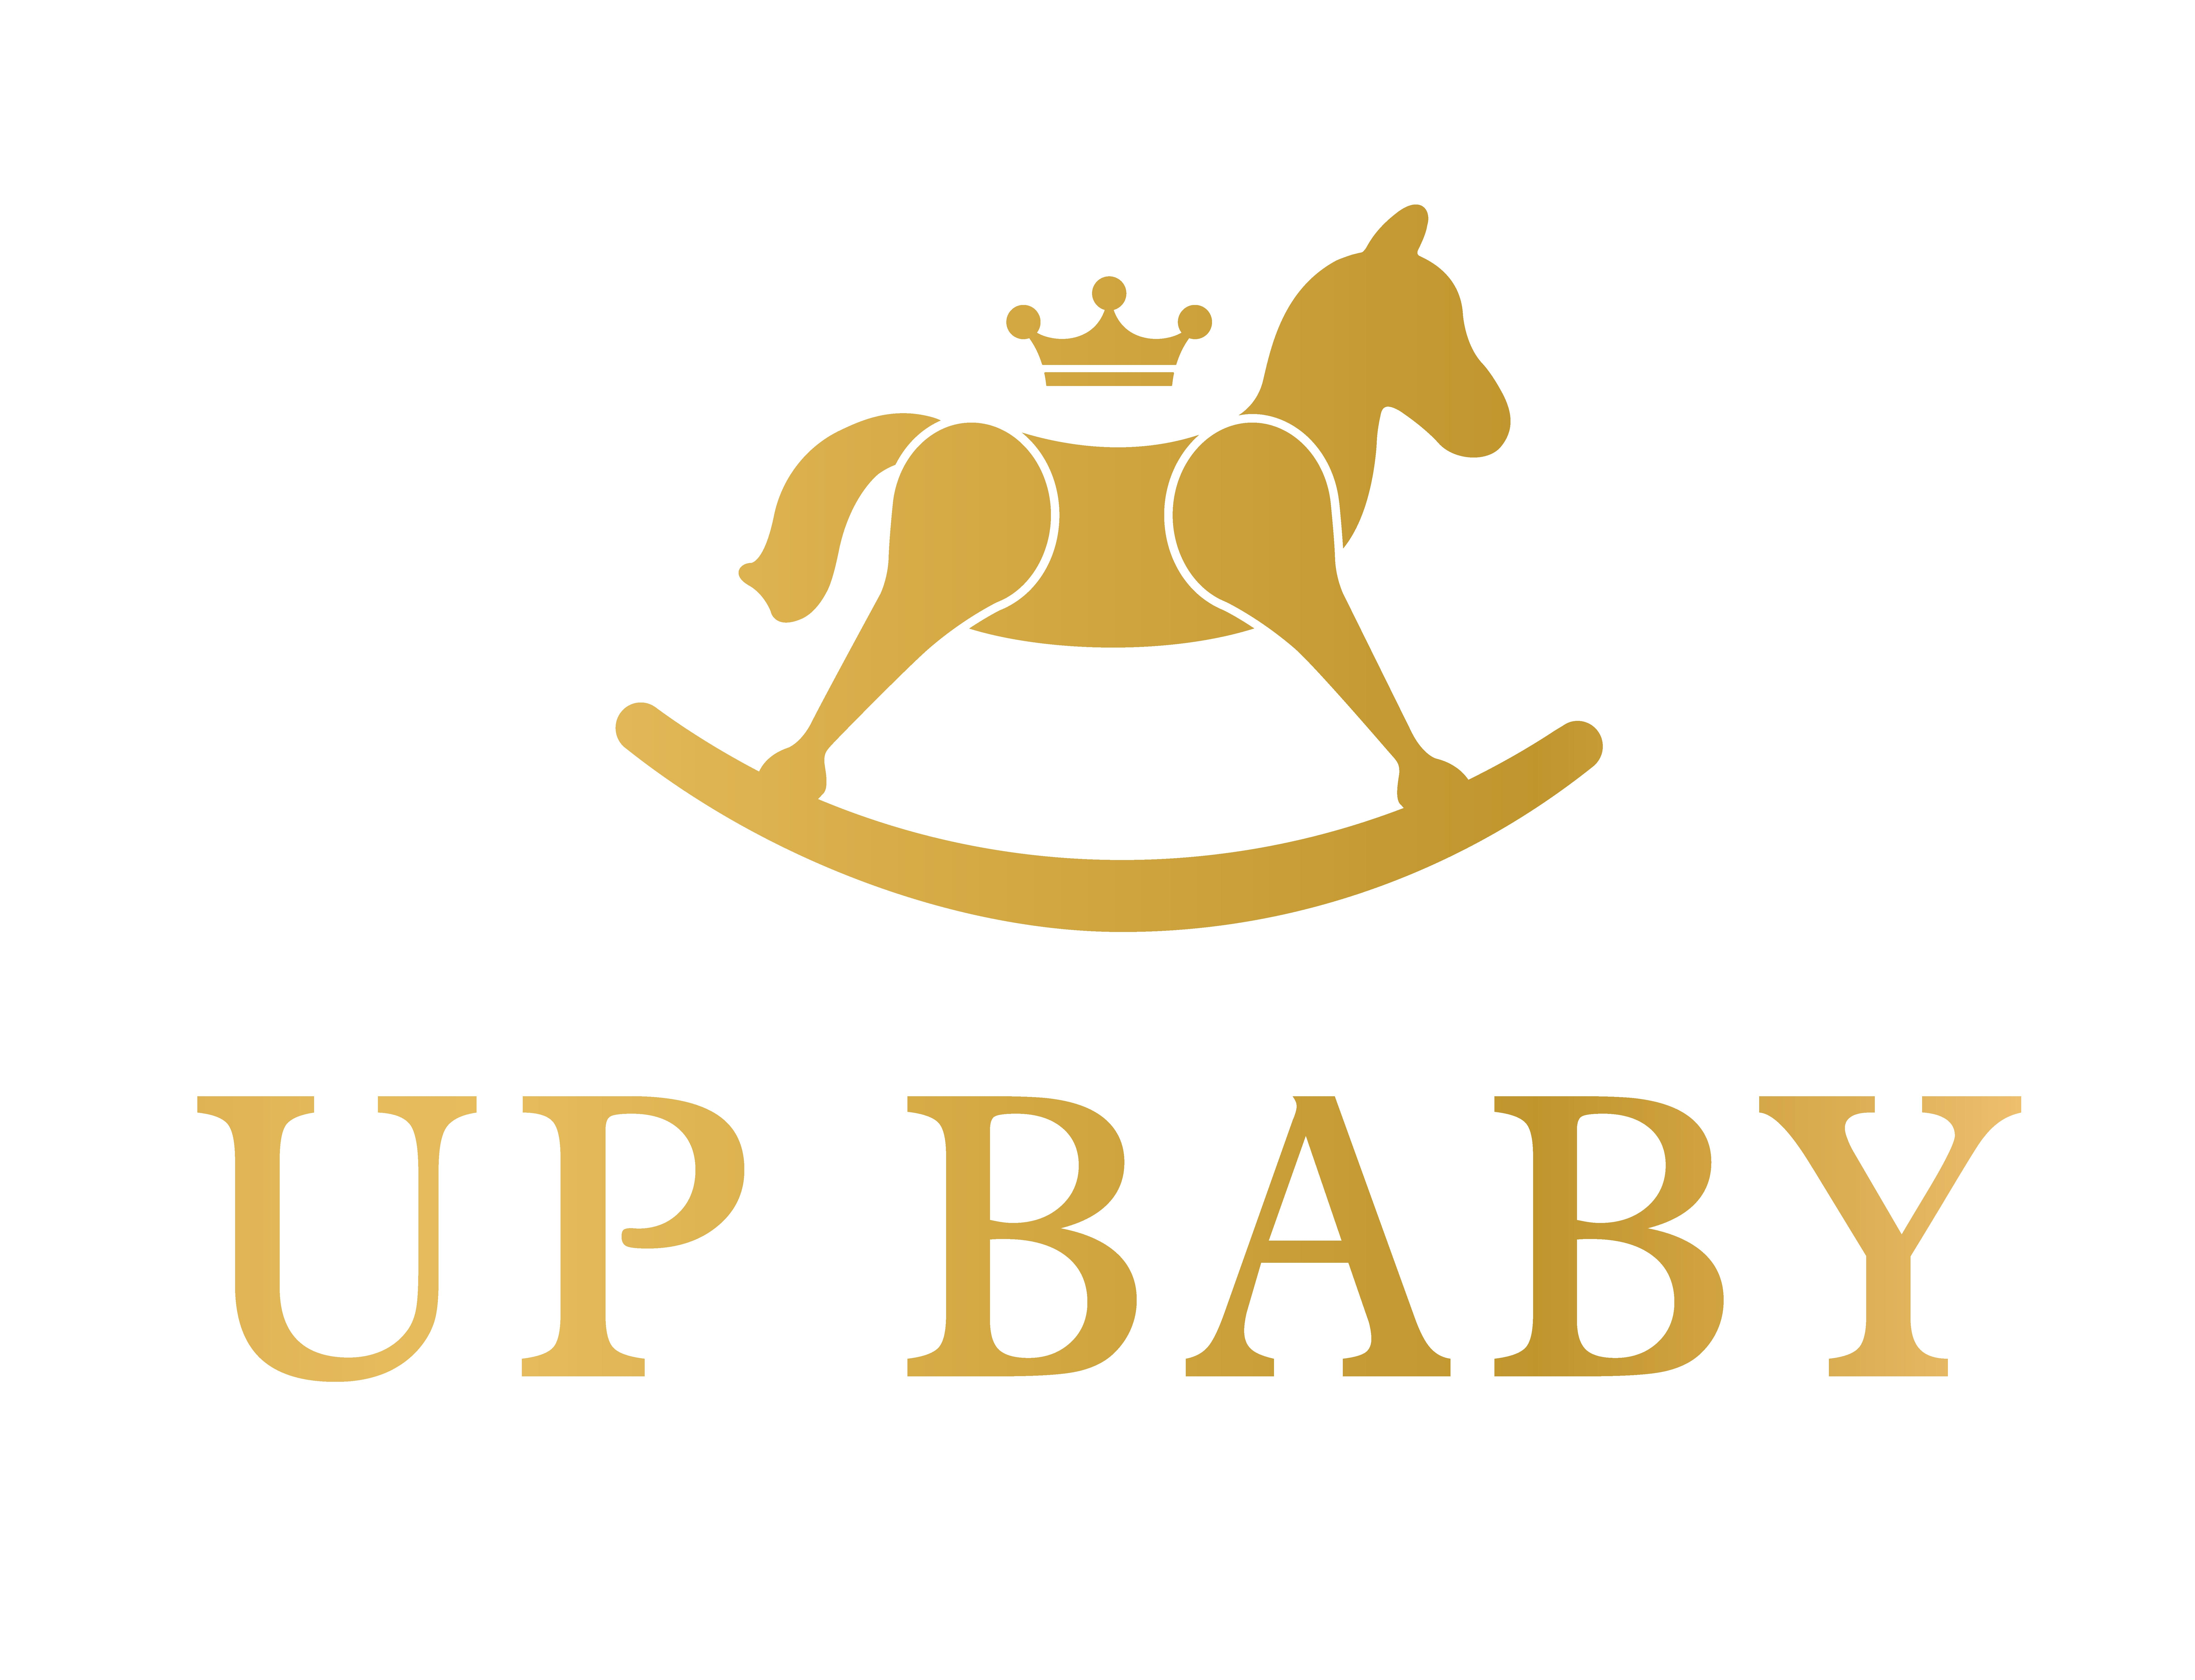 Logo Up Baby